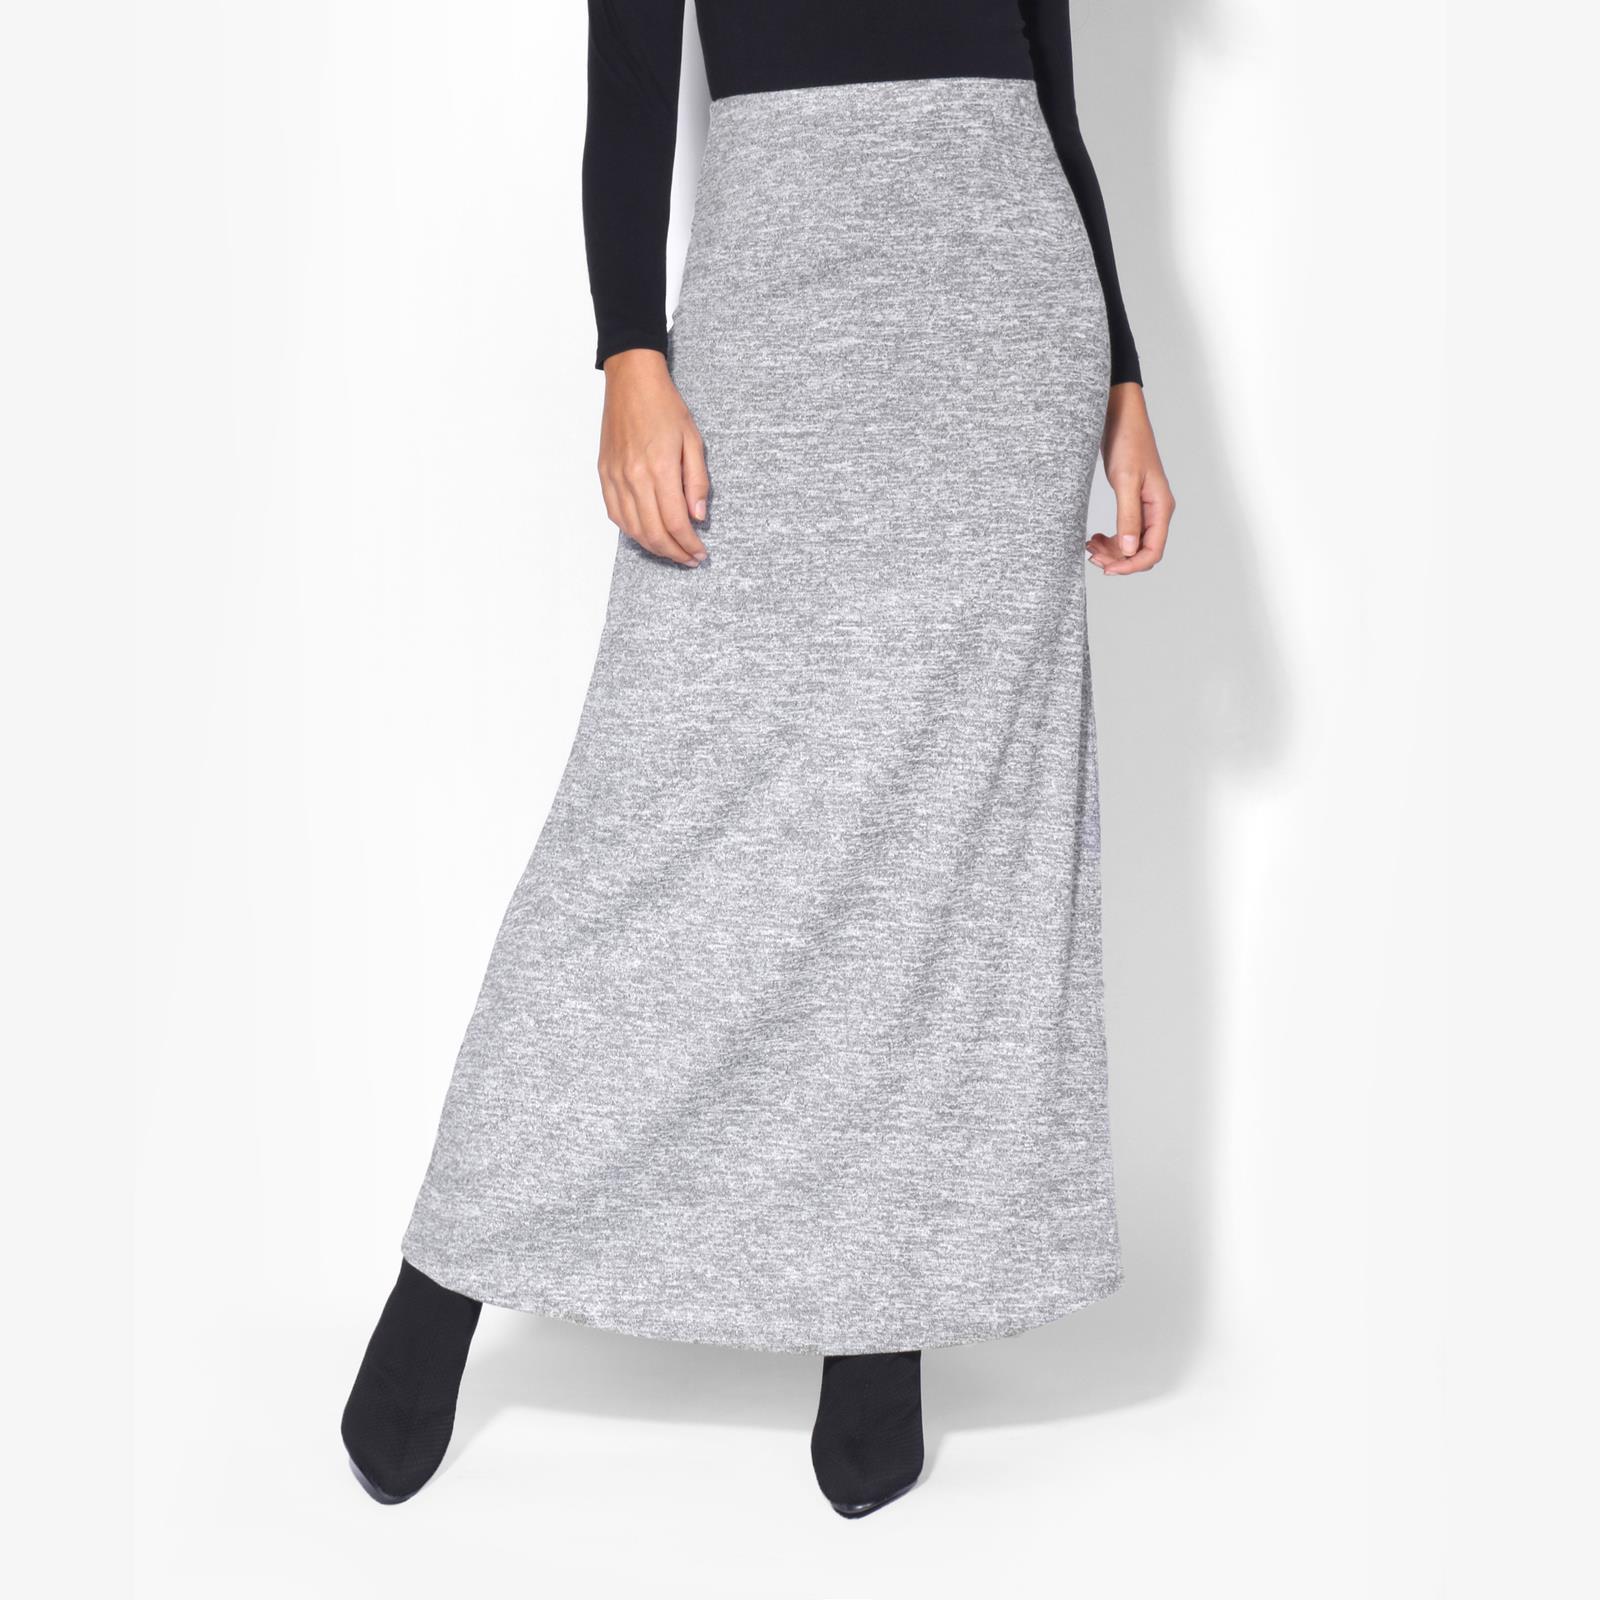 Womens-Ladies-Maxi-Skirt-High-Waist-A-Line-Long-Knit-Stretch-Bodycon-Casual-Boho thumbnail 8